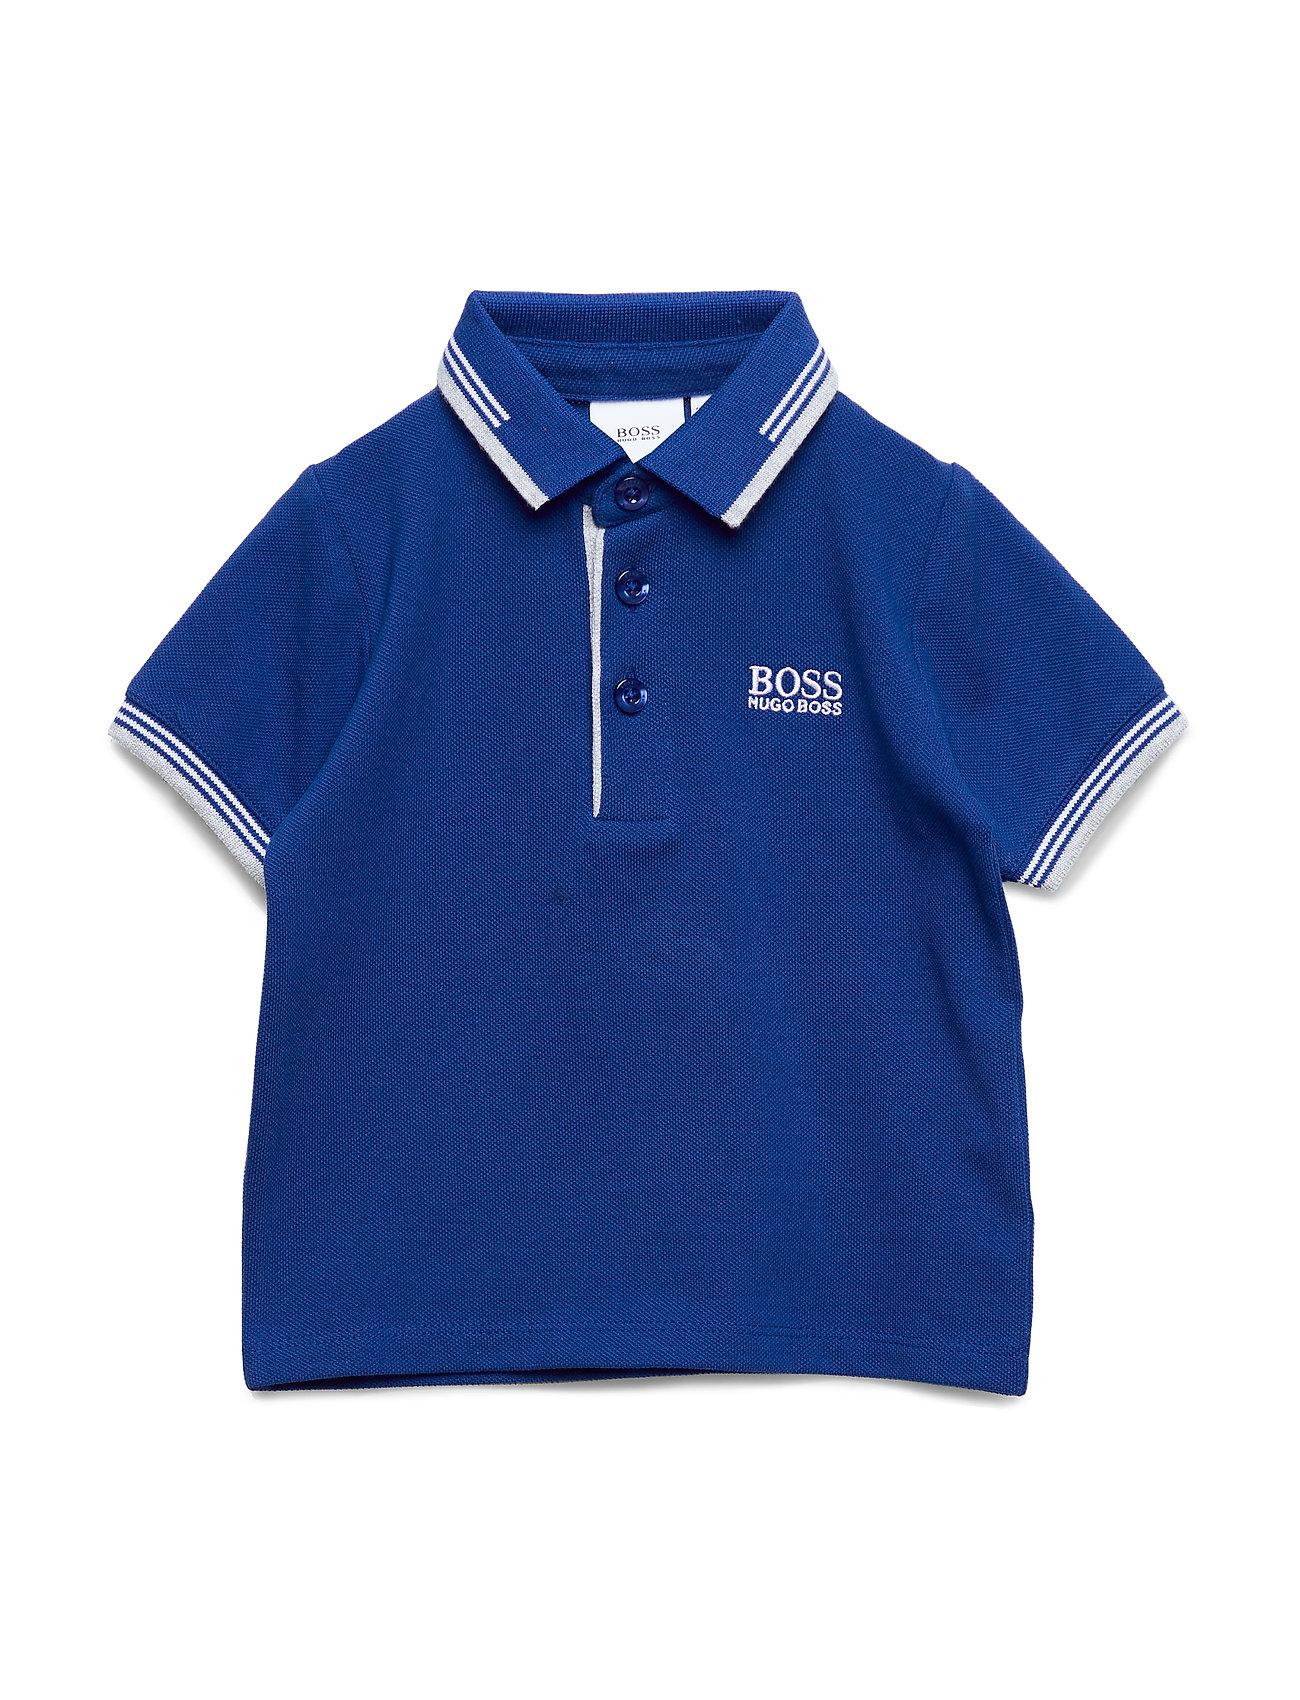 BOSS SHORT SLEEVE POLO - BLUE